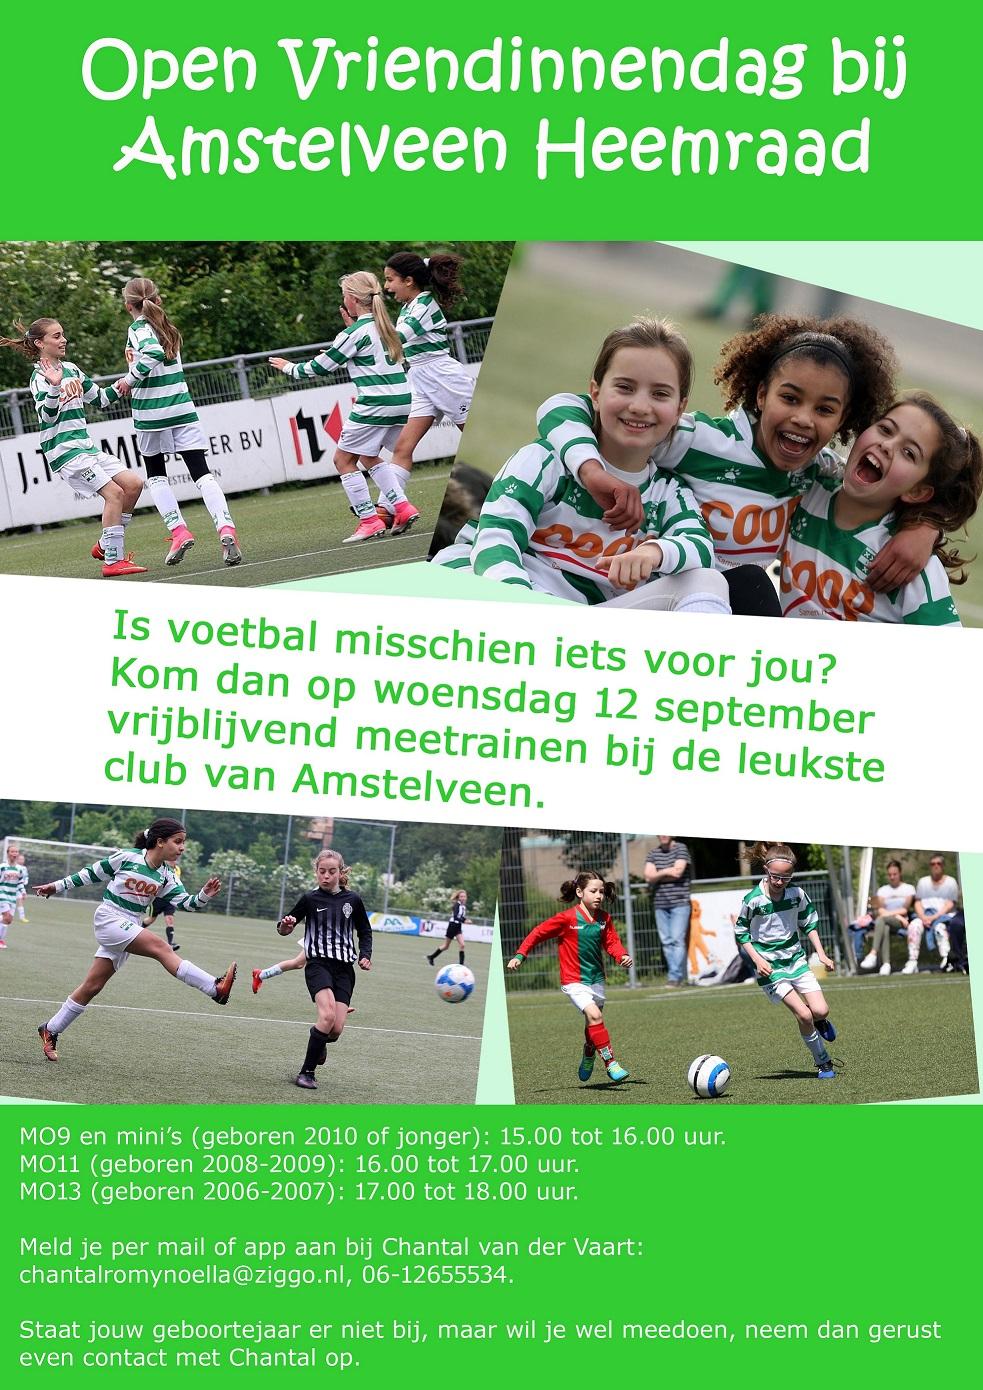 voetbal-vriendinnen-amstelveen